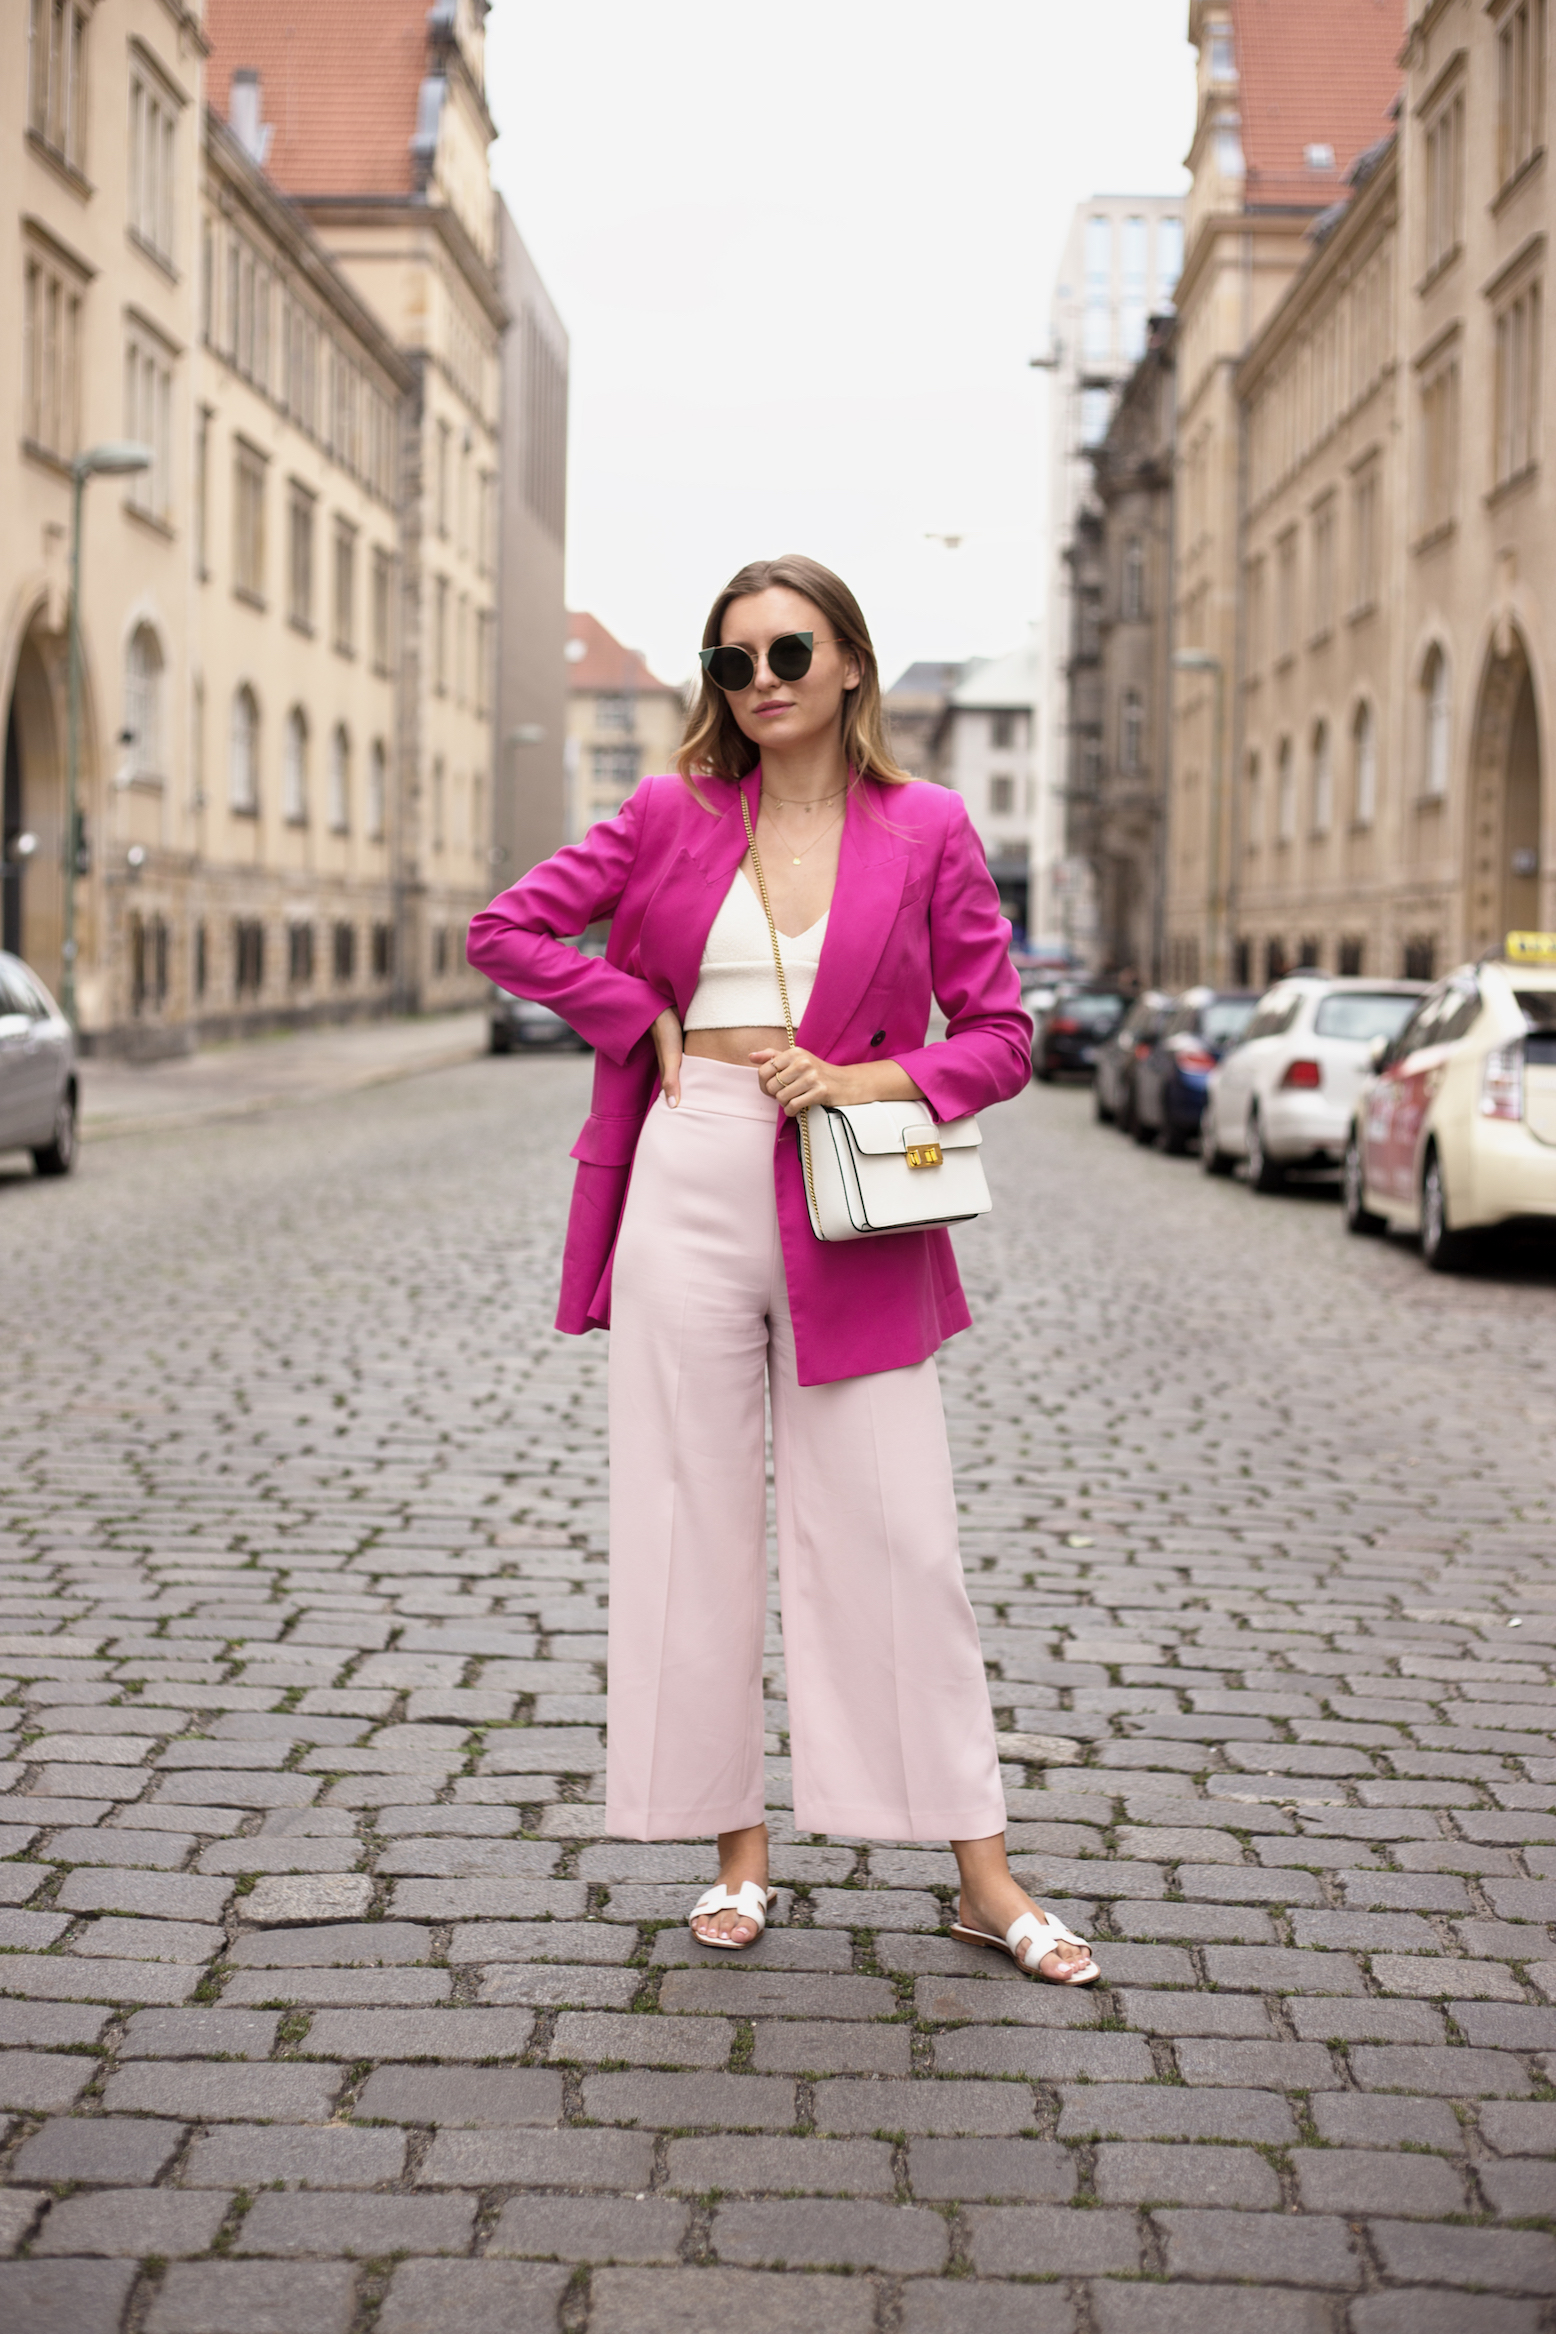 fendi-lei-sunglasses-hermes-oran-livia-auer-IMG_9352